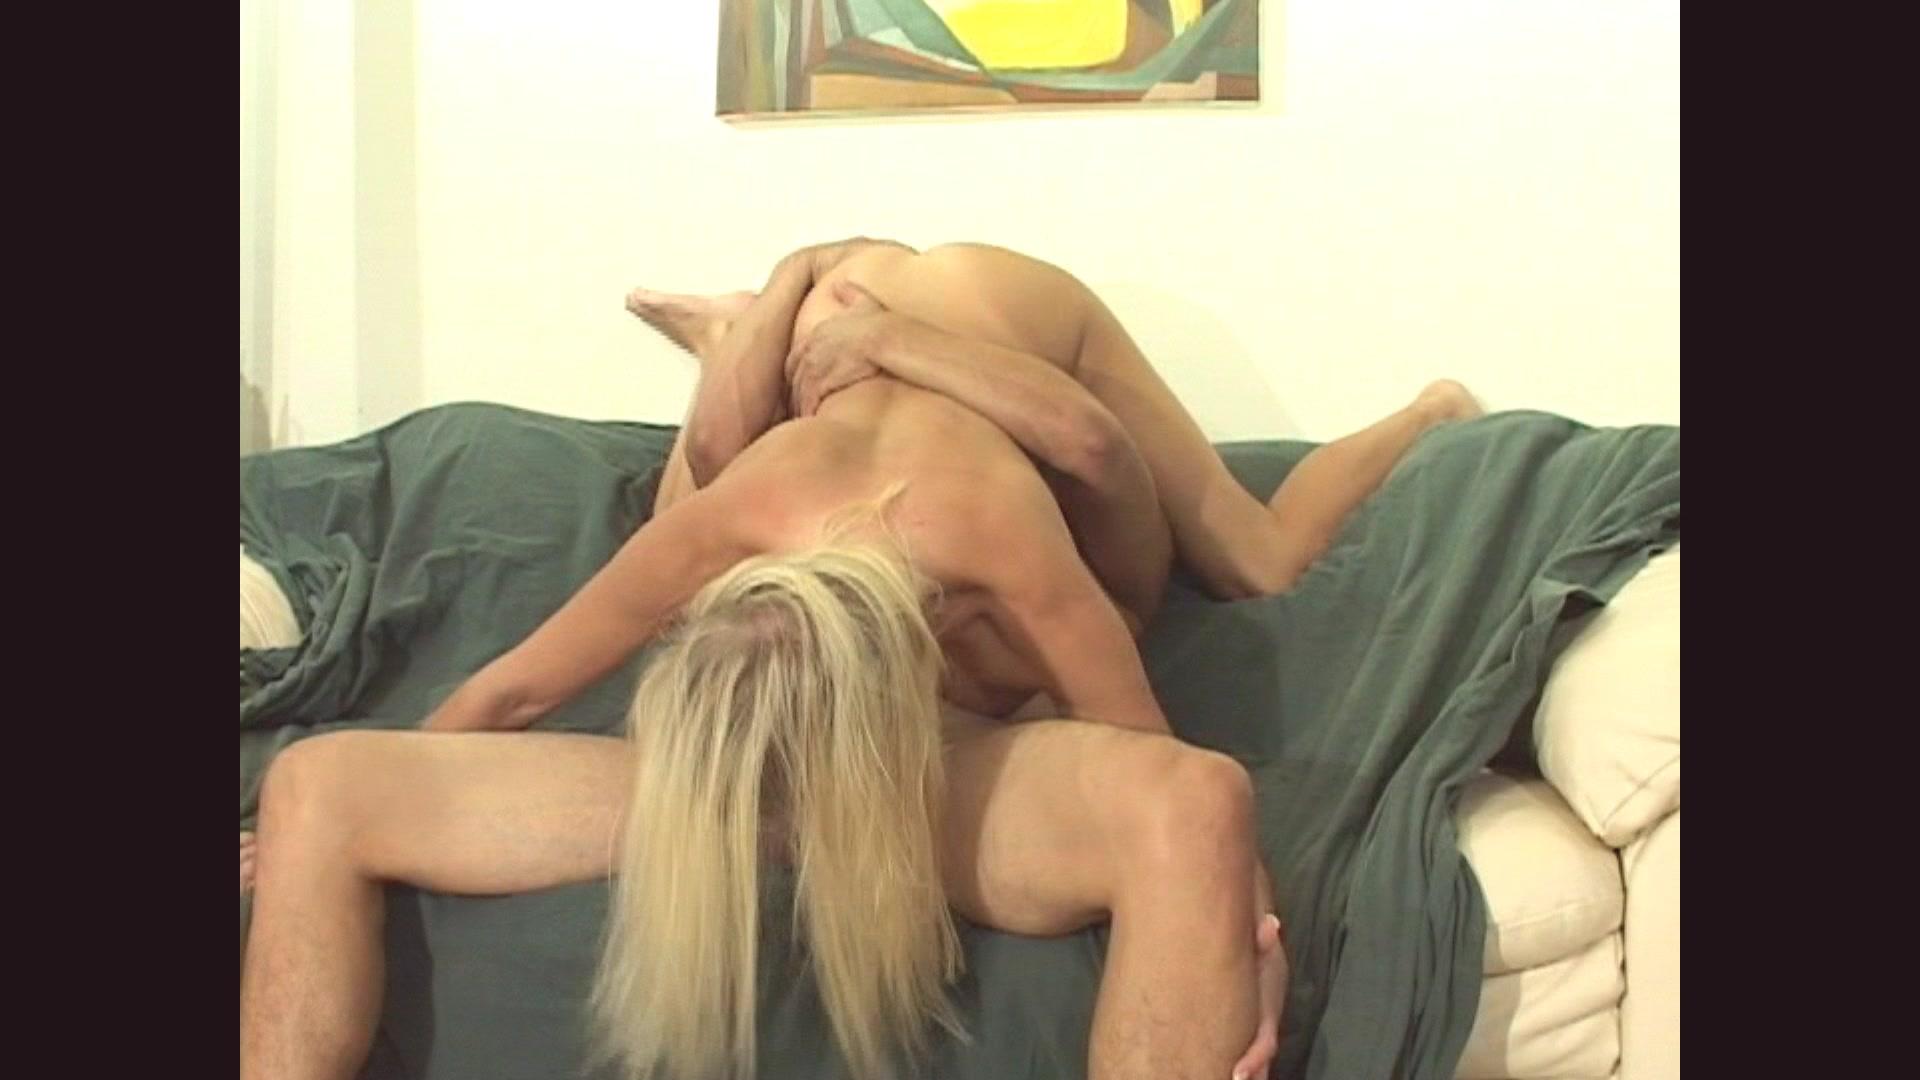 sexwork helsinki hottie cum